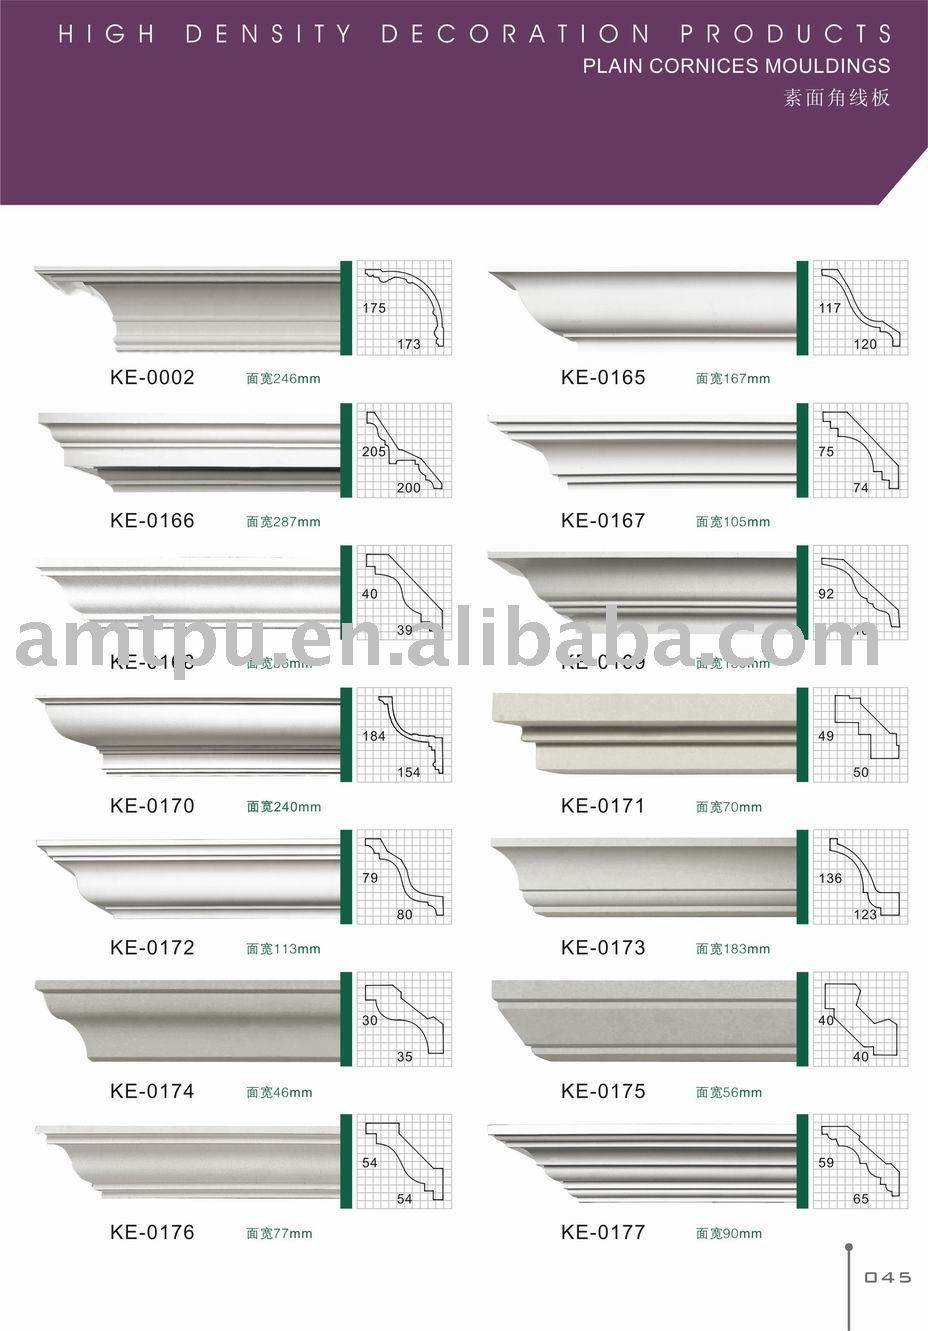 ceiling cornice/resin cornice/pu cornice - buy ceiling cornice